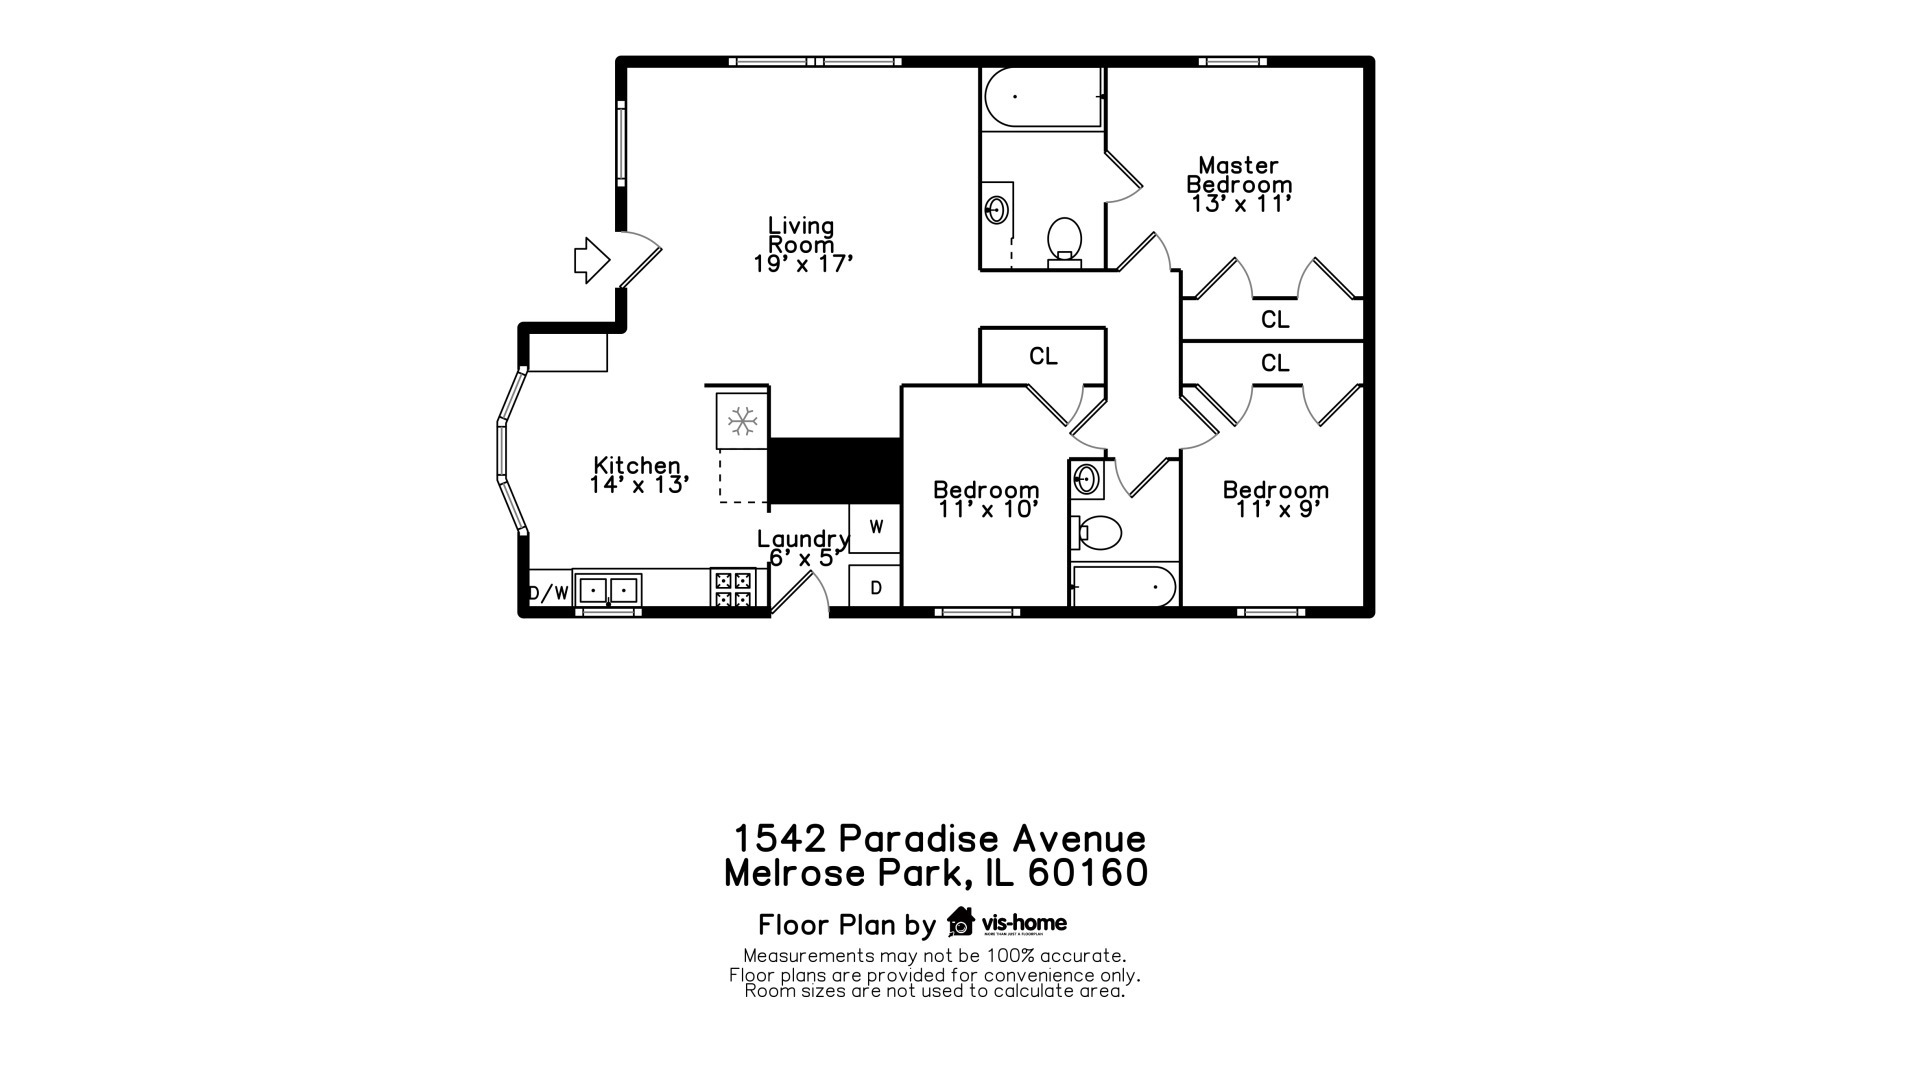 1542 Paradise, Melrose Park, Illinois, 60160